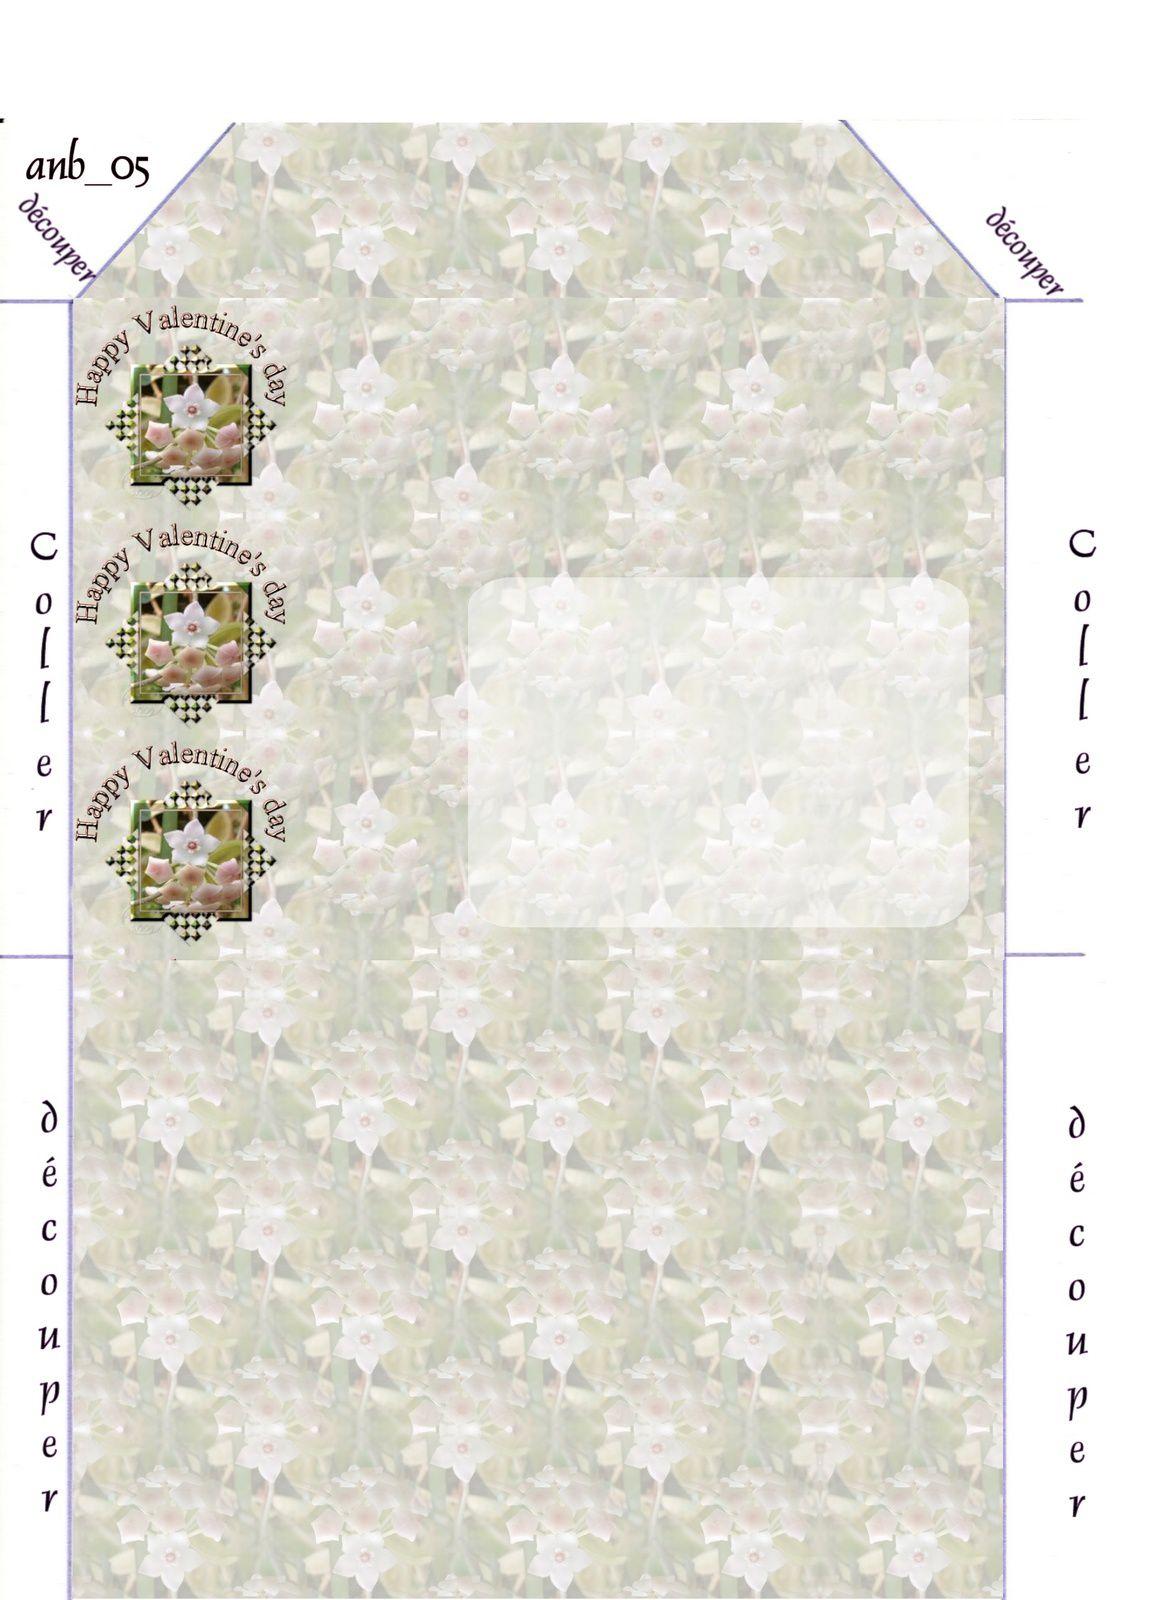 happy valentine 39 s day saint valentin incredimail papier. Black Bedroom Furniture Sets. Home Design Ideas